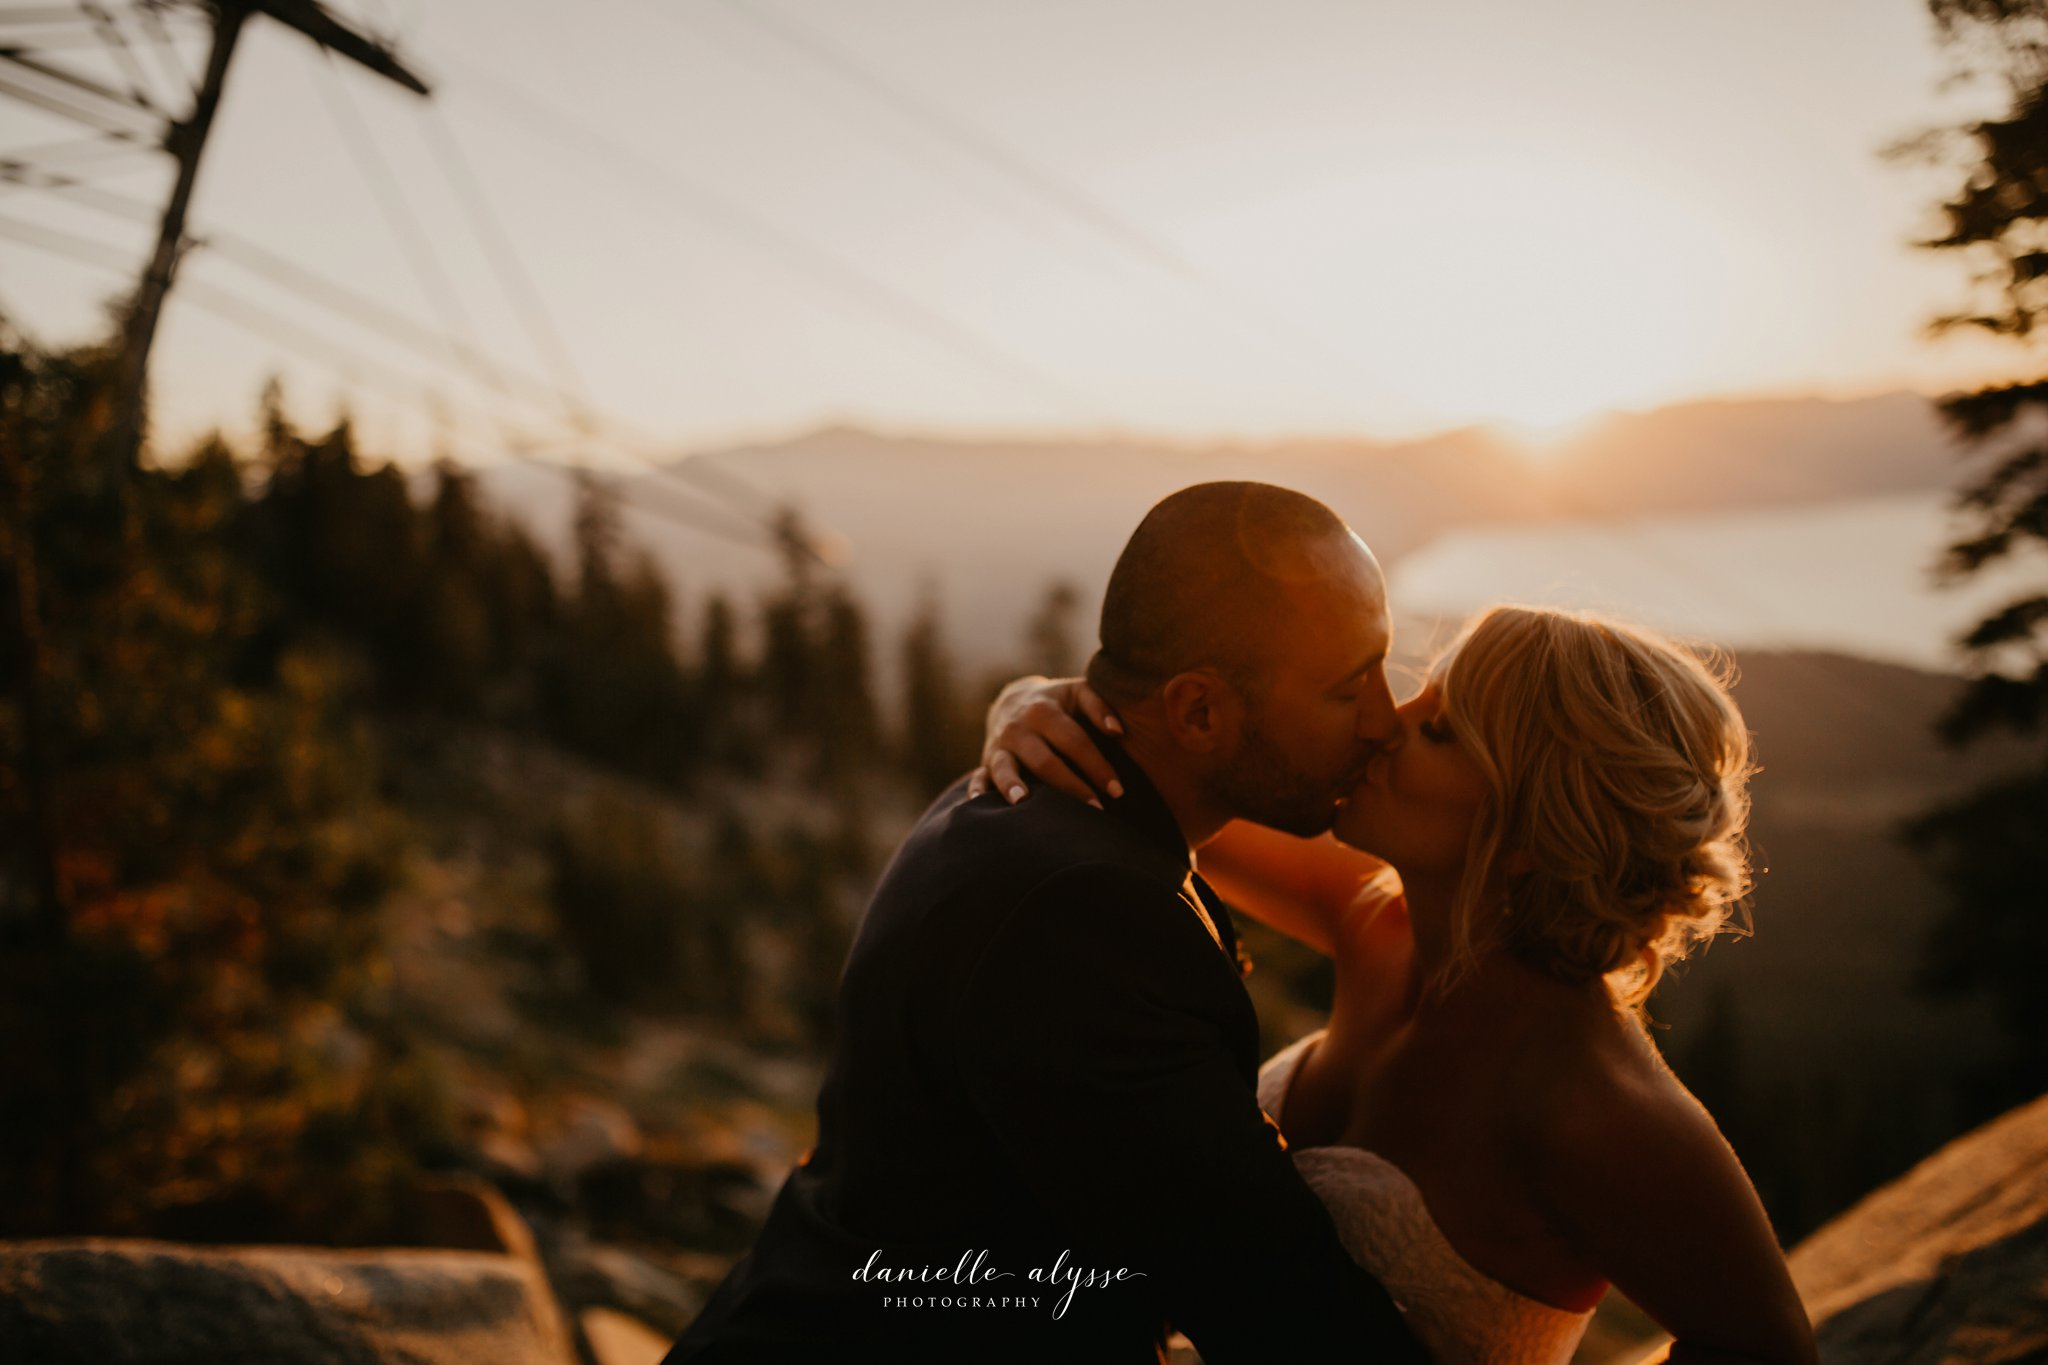 180831_wedding_stephanie_heavenly_south_lake_tahoe_danielle_alysse_photography_destination_blog_1020_WEB.jpg